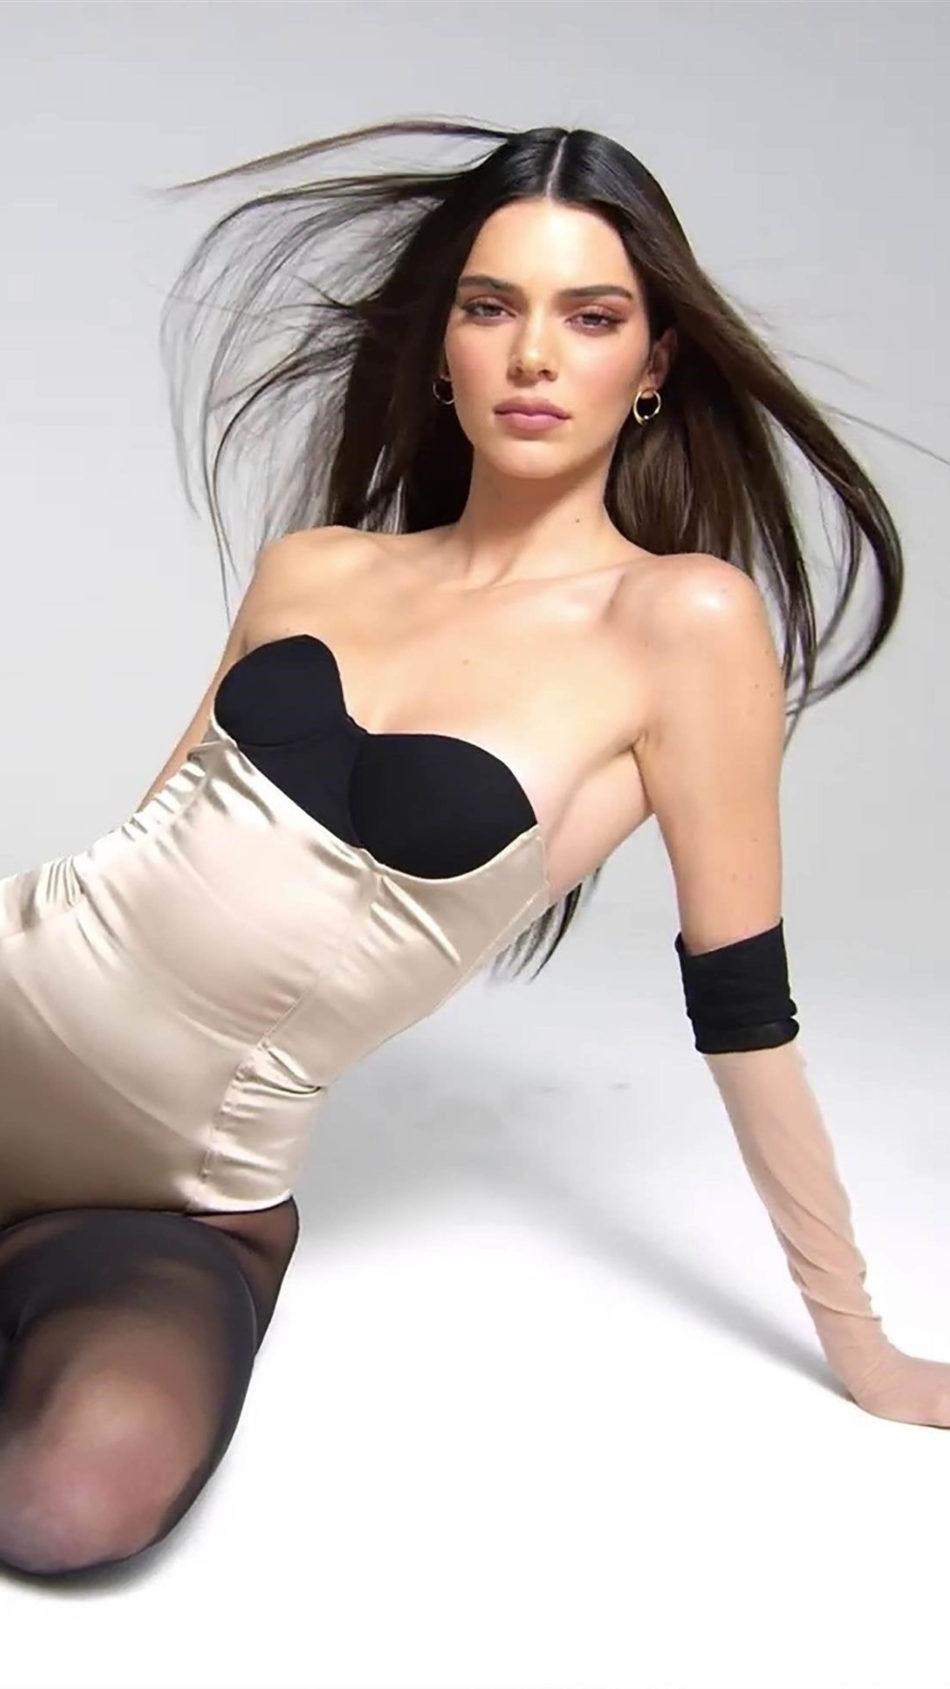 Kendall Jenner Hot Photoshoot 4K Ultra HD Mobile Wallpaper